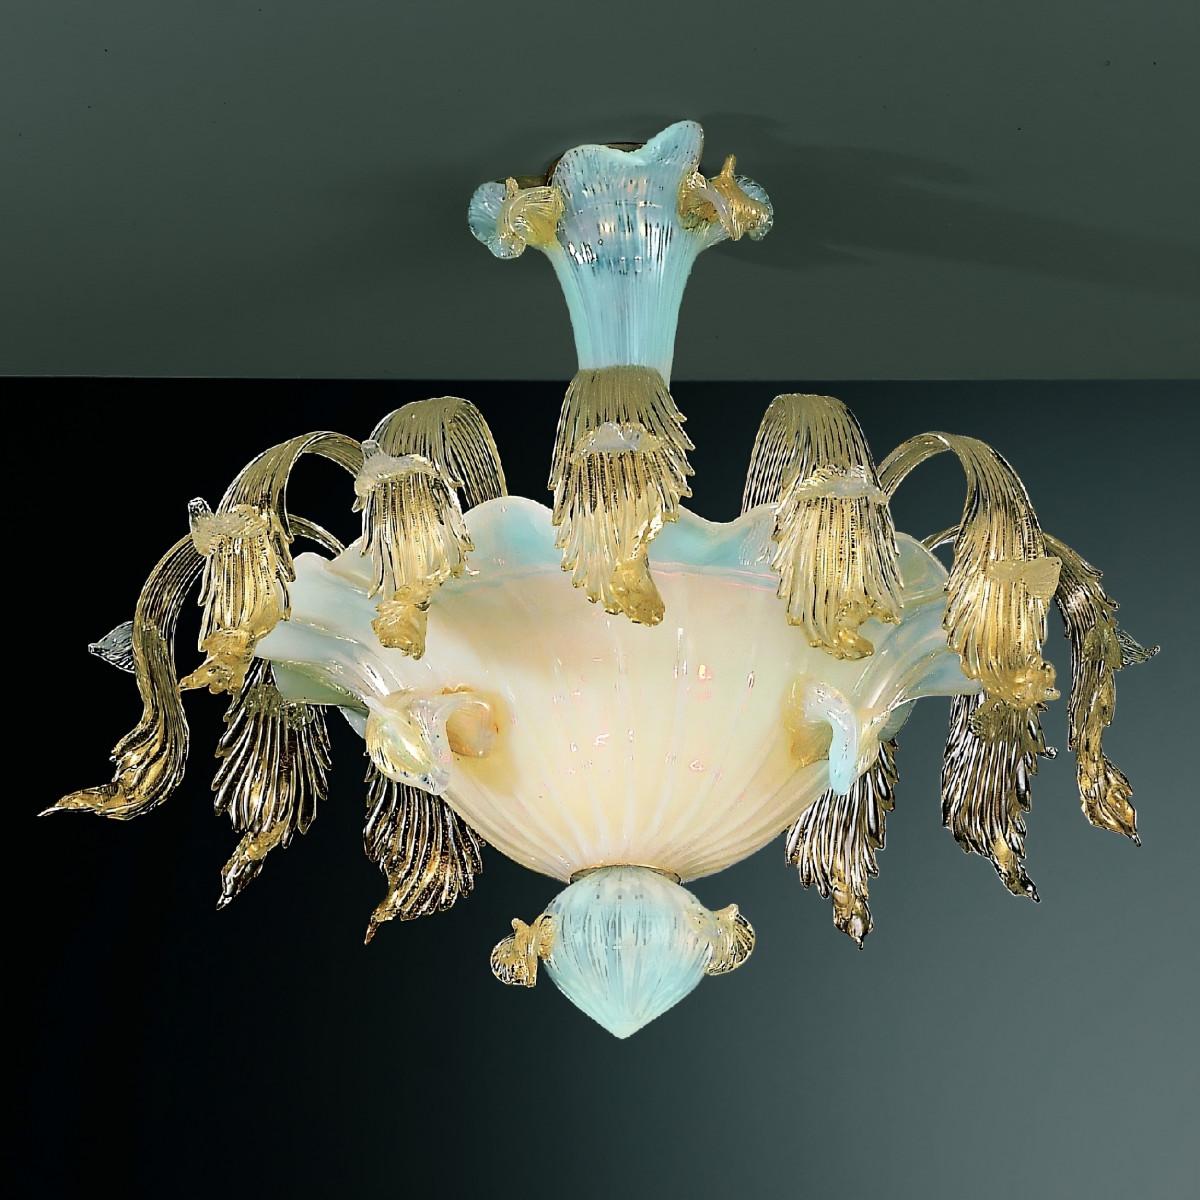 Accademia 6 flammig Murano-Deckenleuchte -opal und gold Farbe